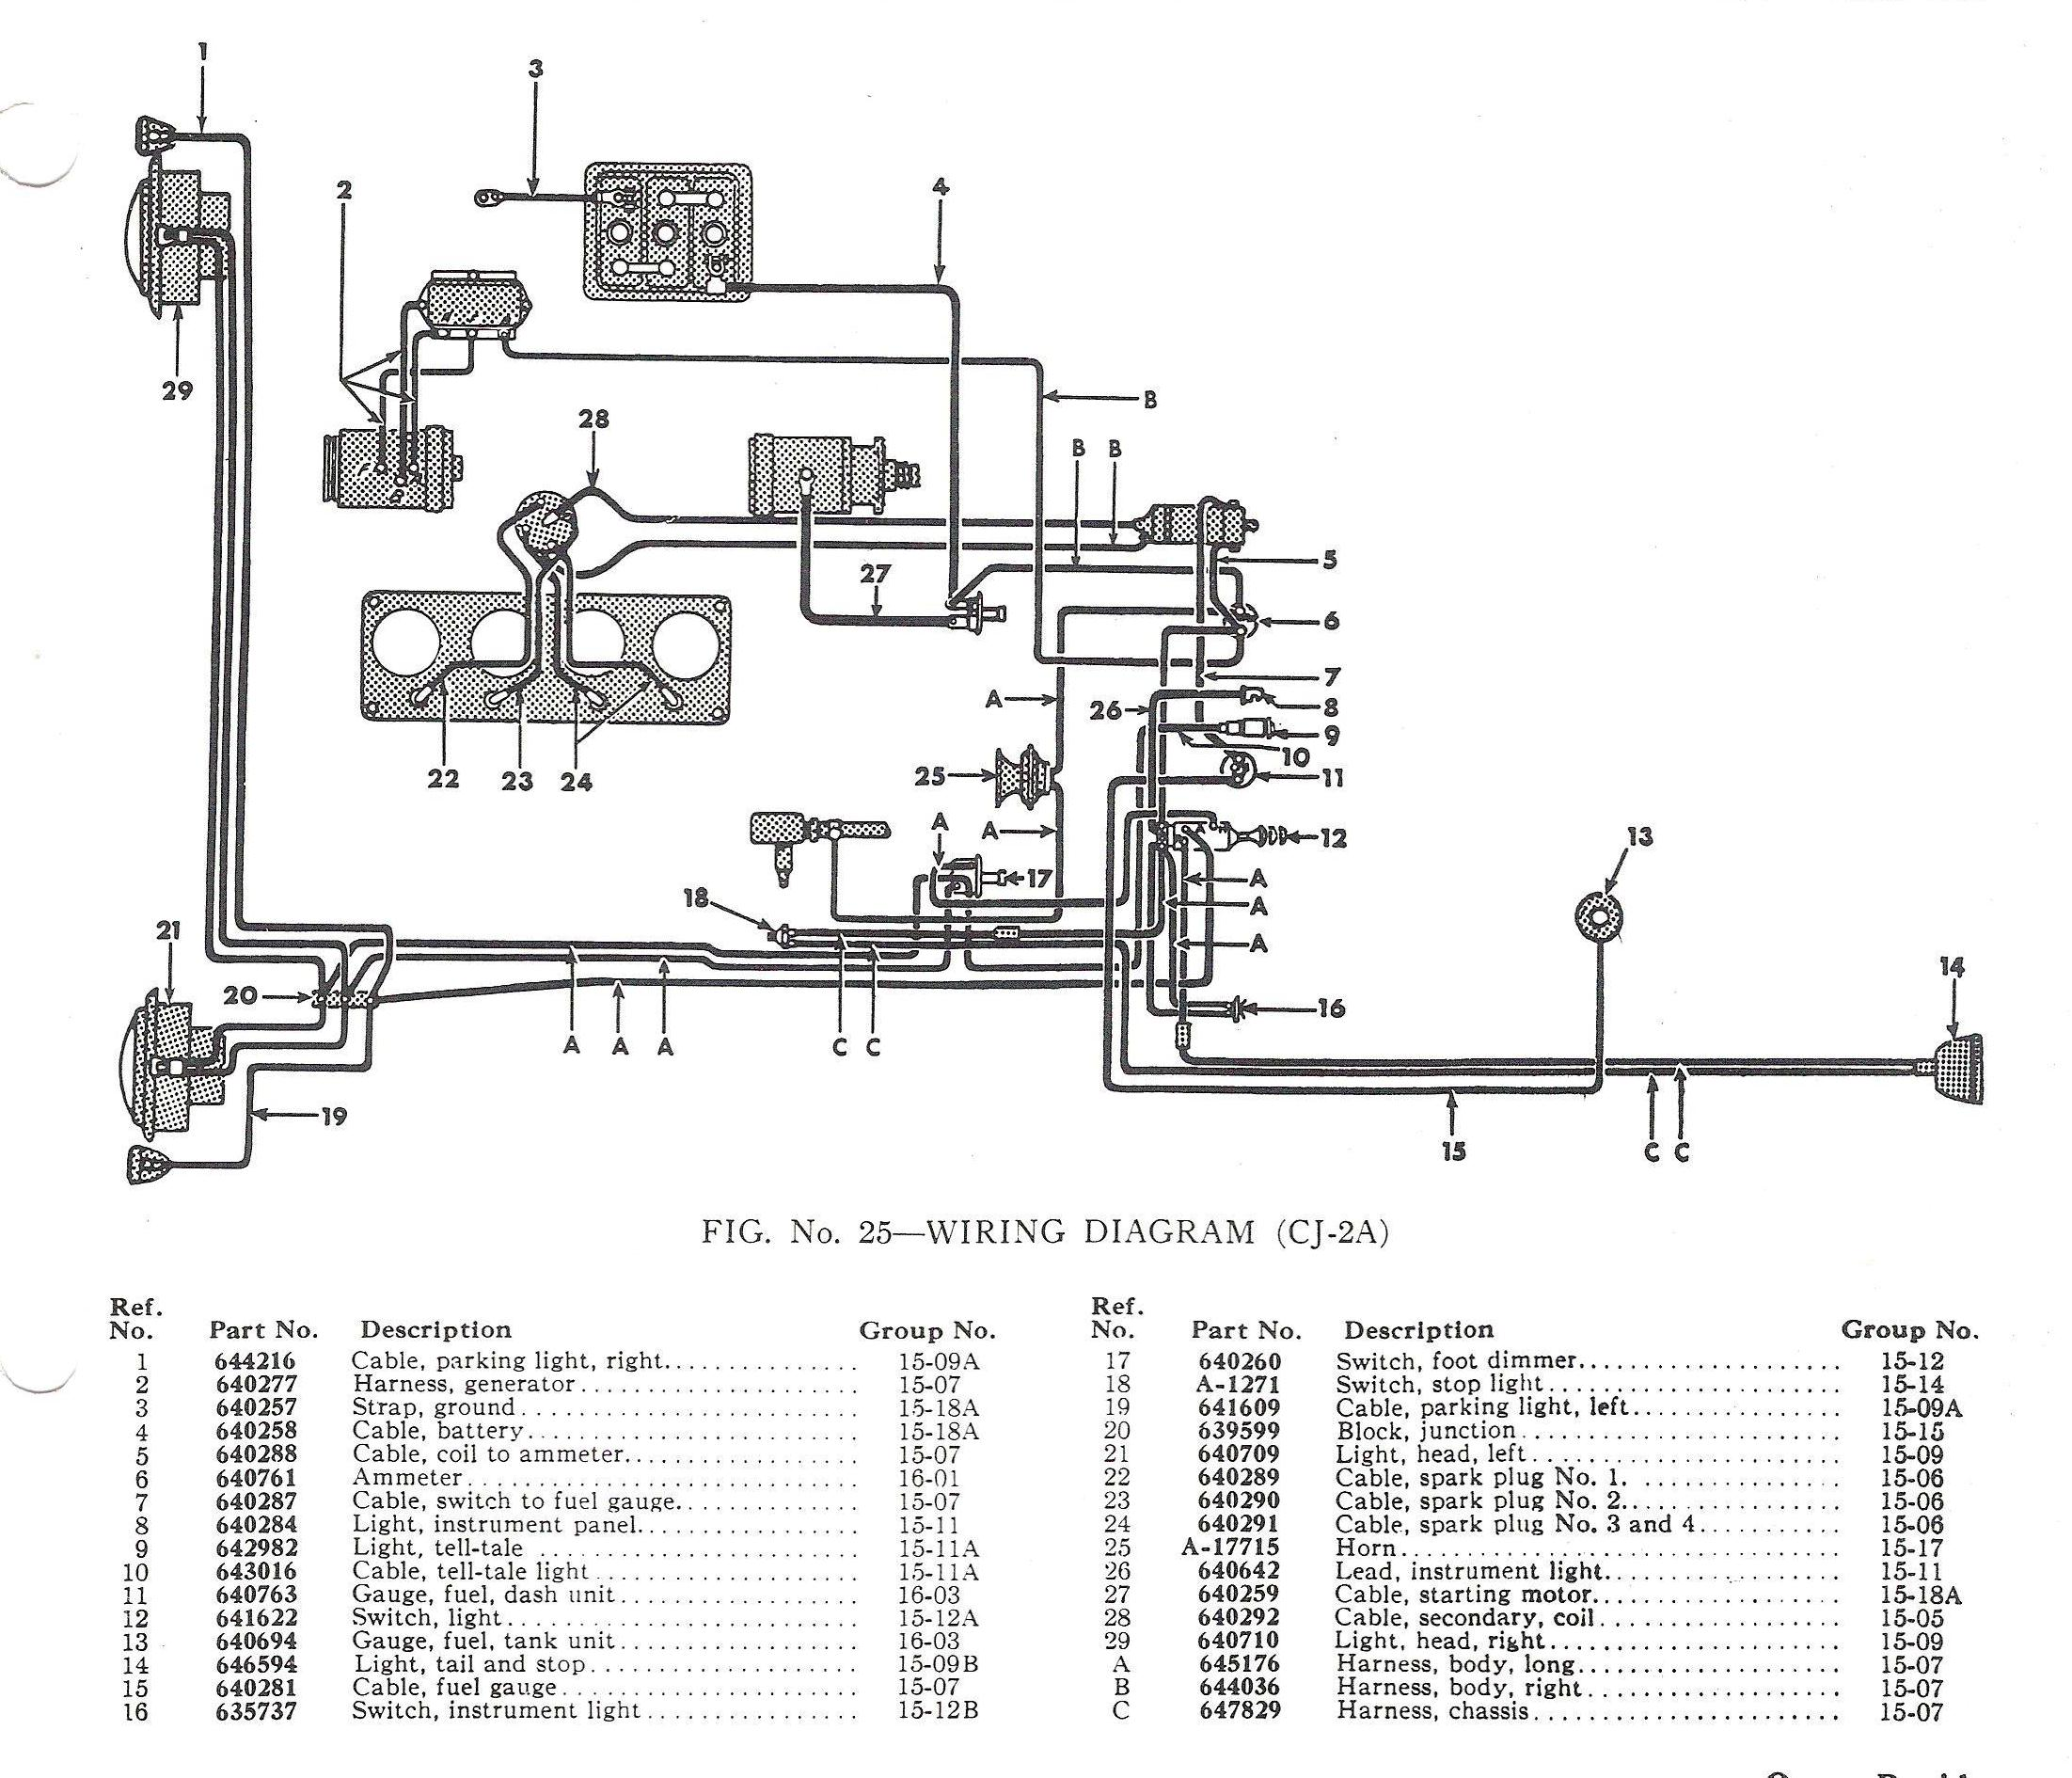 Cj3b Willys Jeep Wiring Diagram 2003 Impala Fuse Box Location Yamaha Phazer Yenpancane Jeanjaures37 Fr